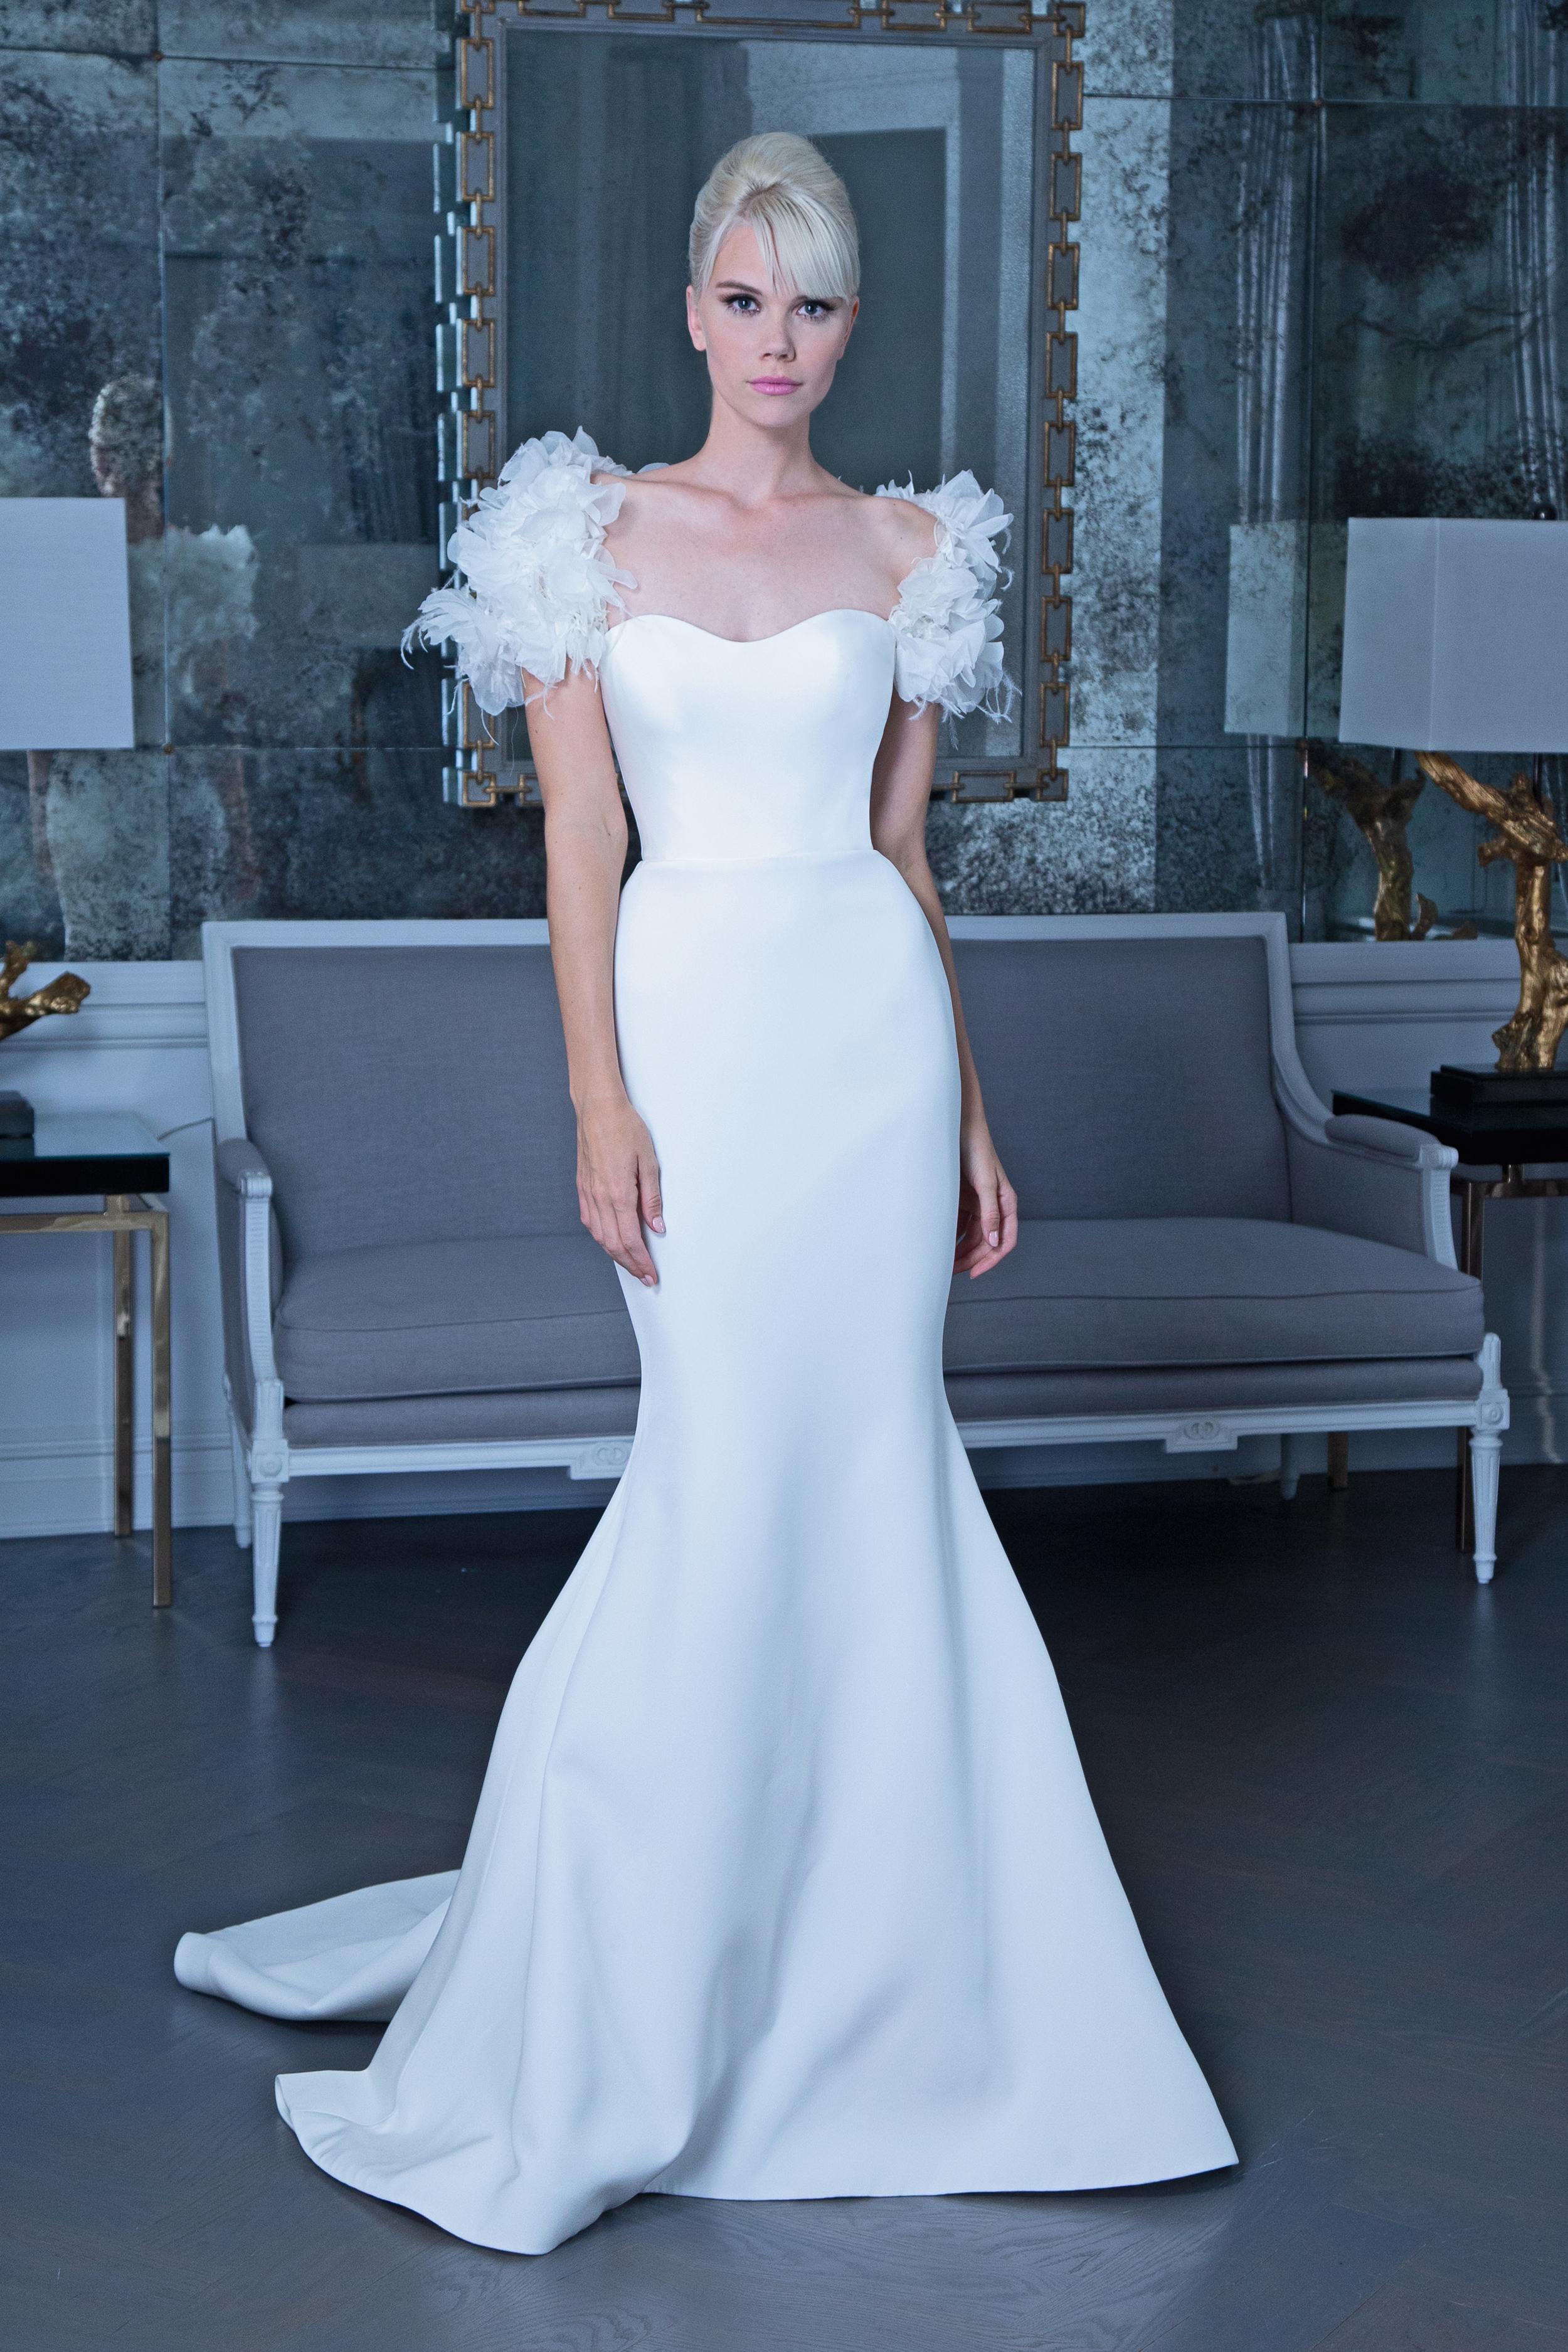 Romona trumpet wedding dress with puff sleeves fall 2019